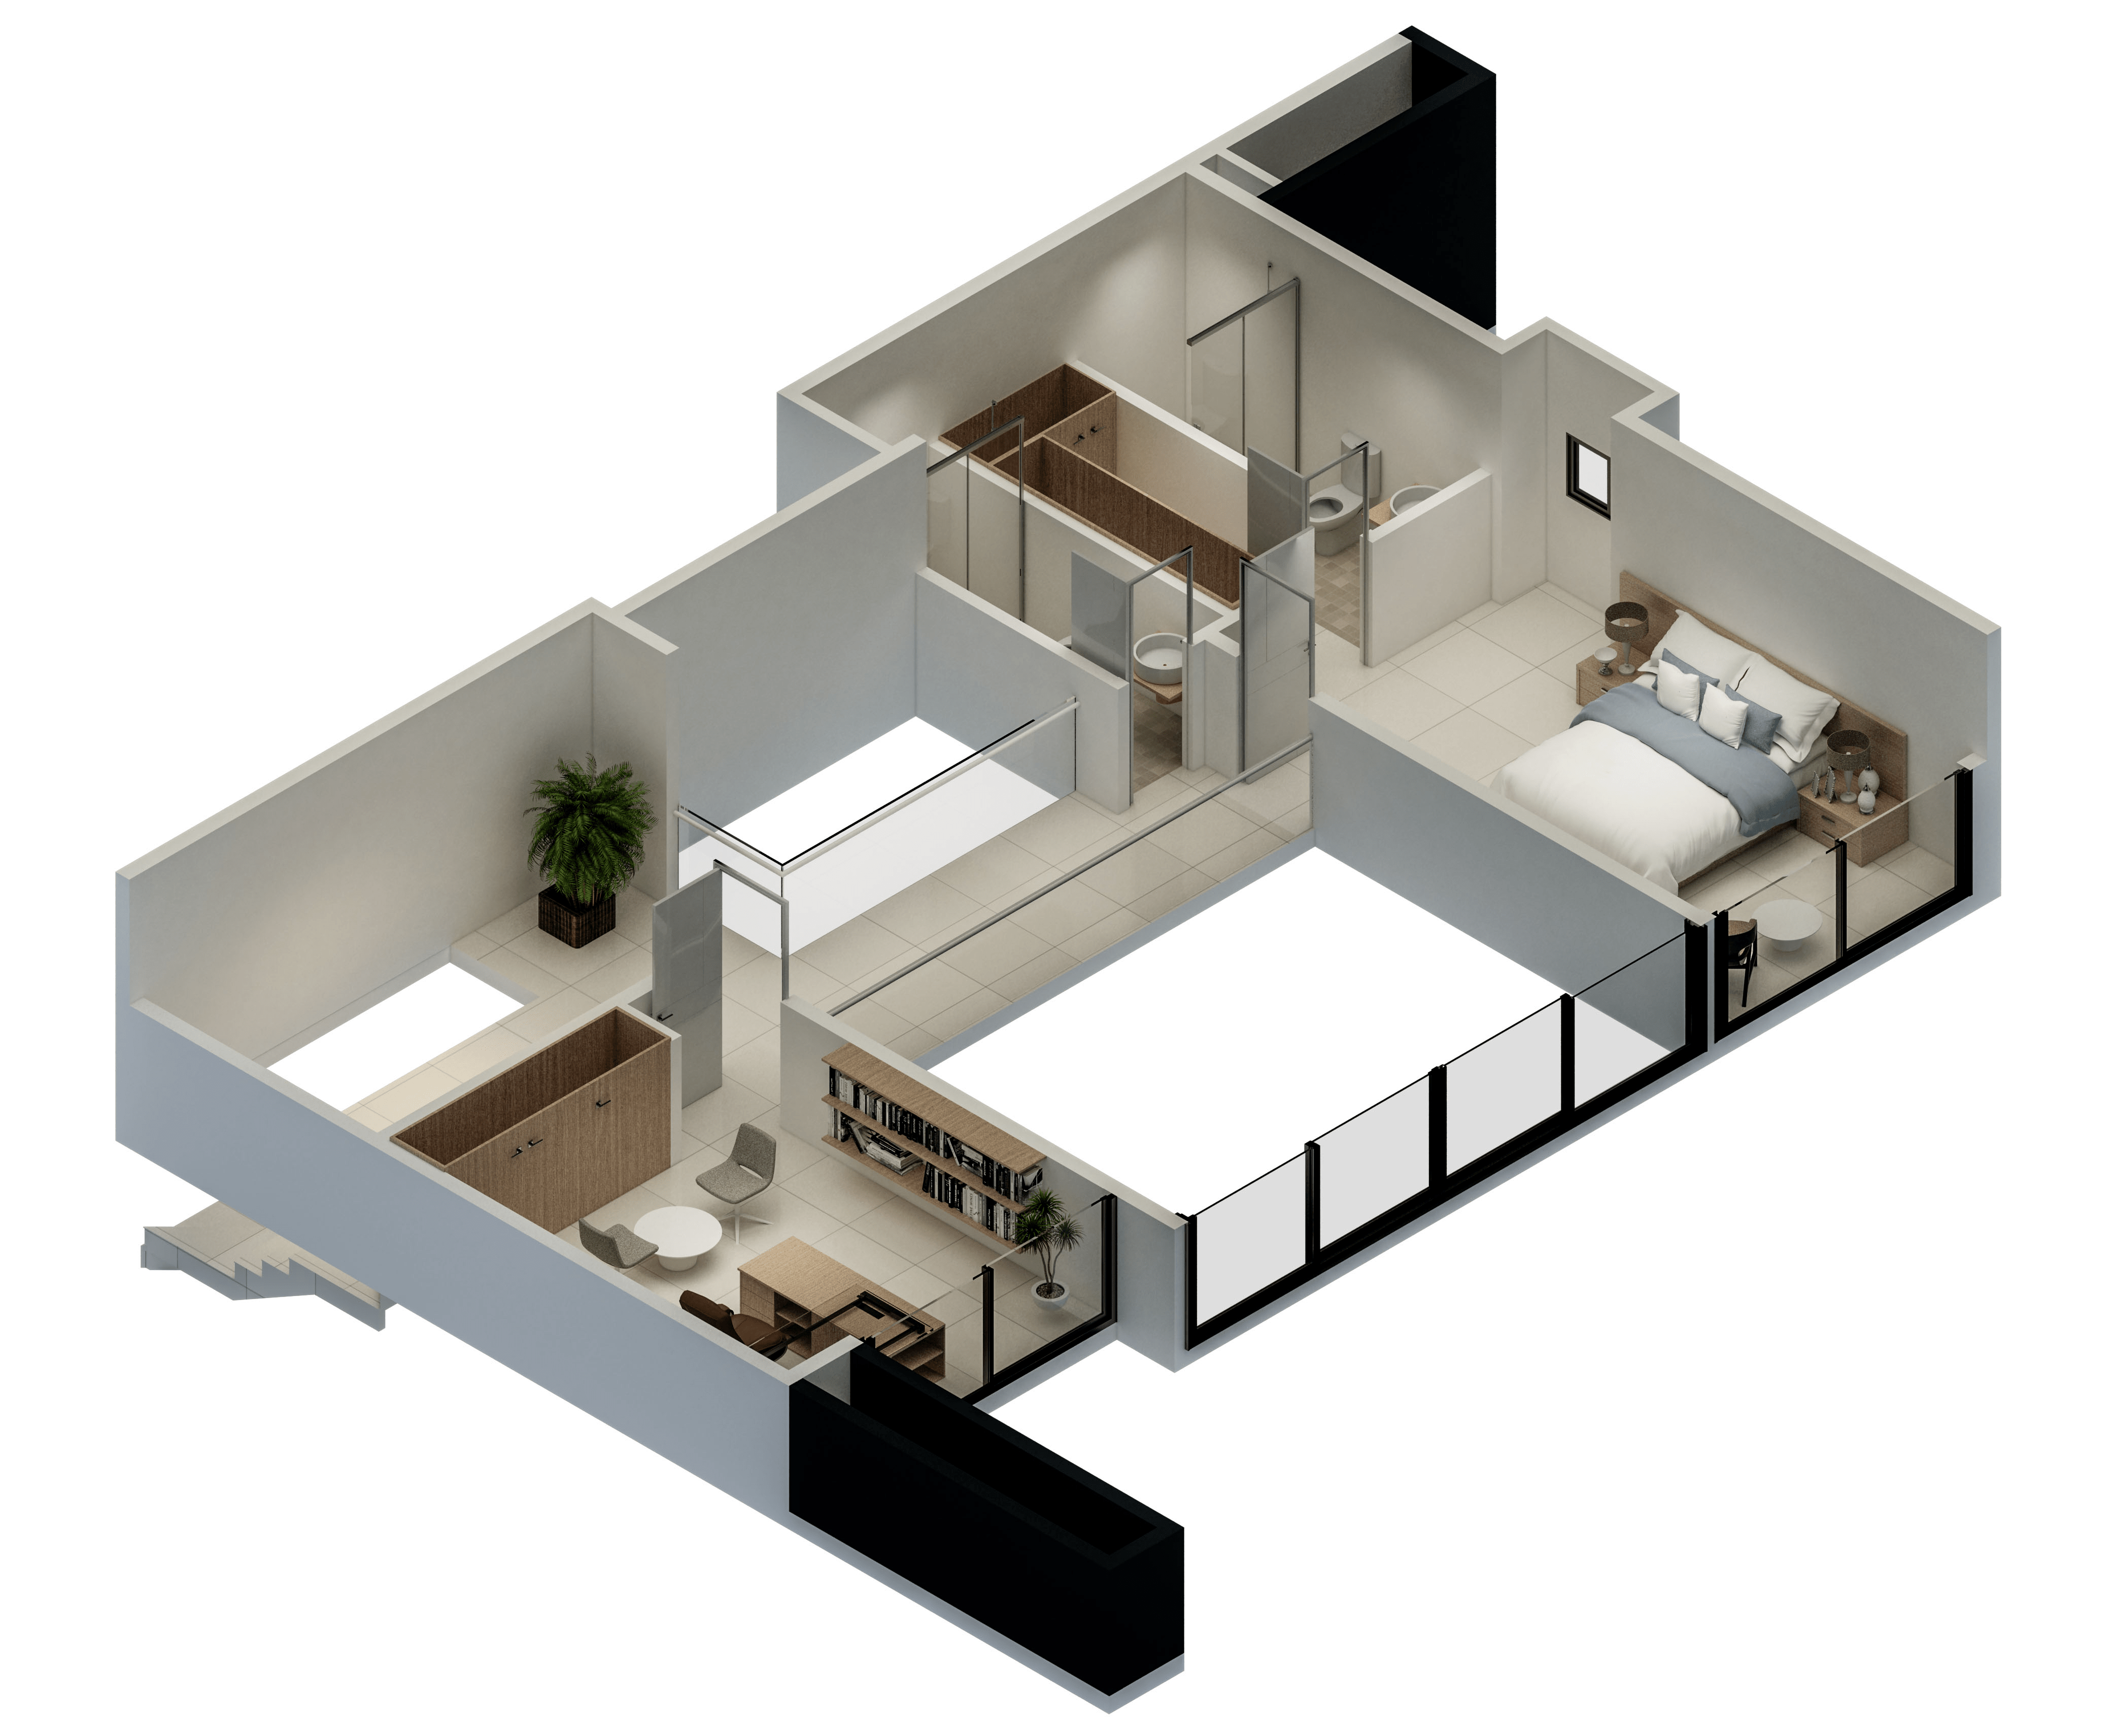 penthouse_5_alcobas_isometrica_1-min